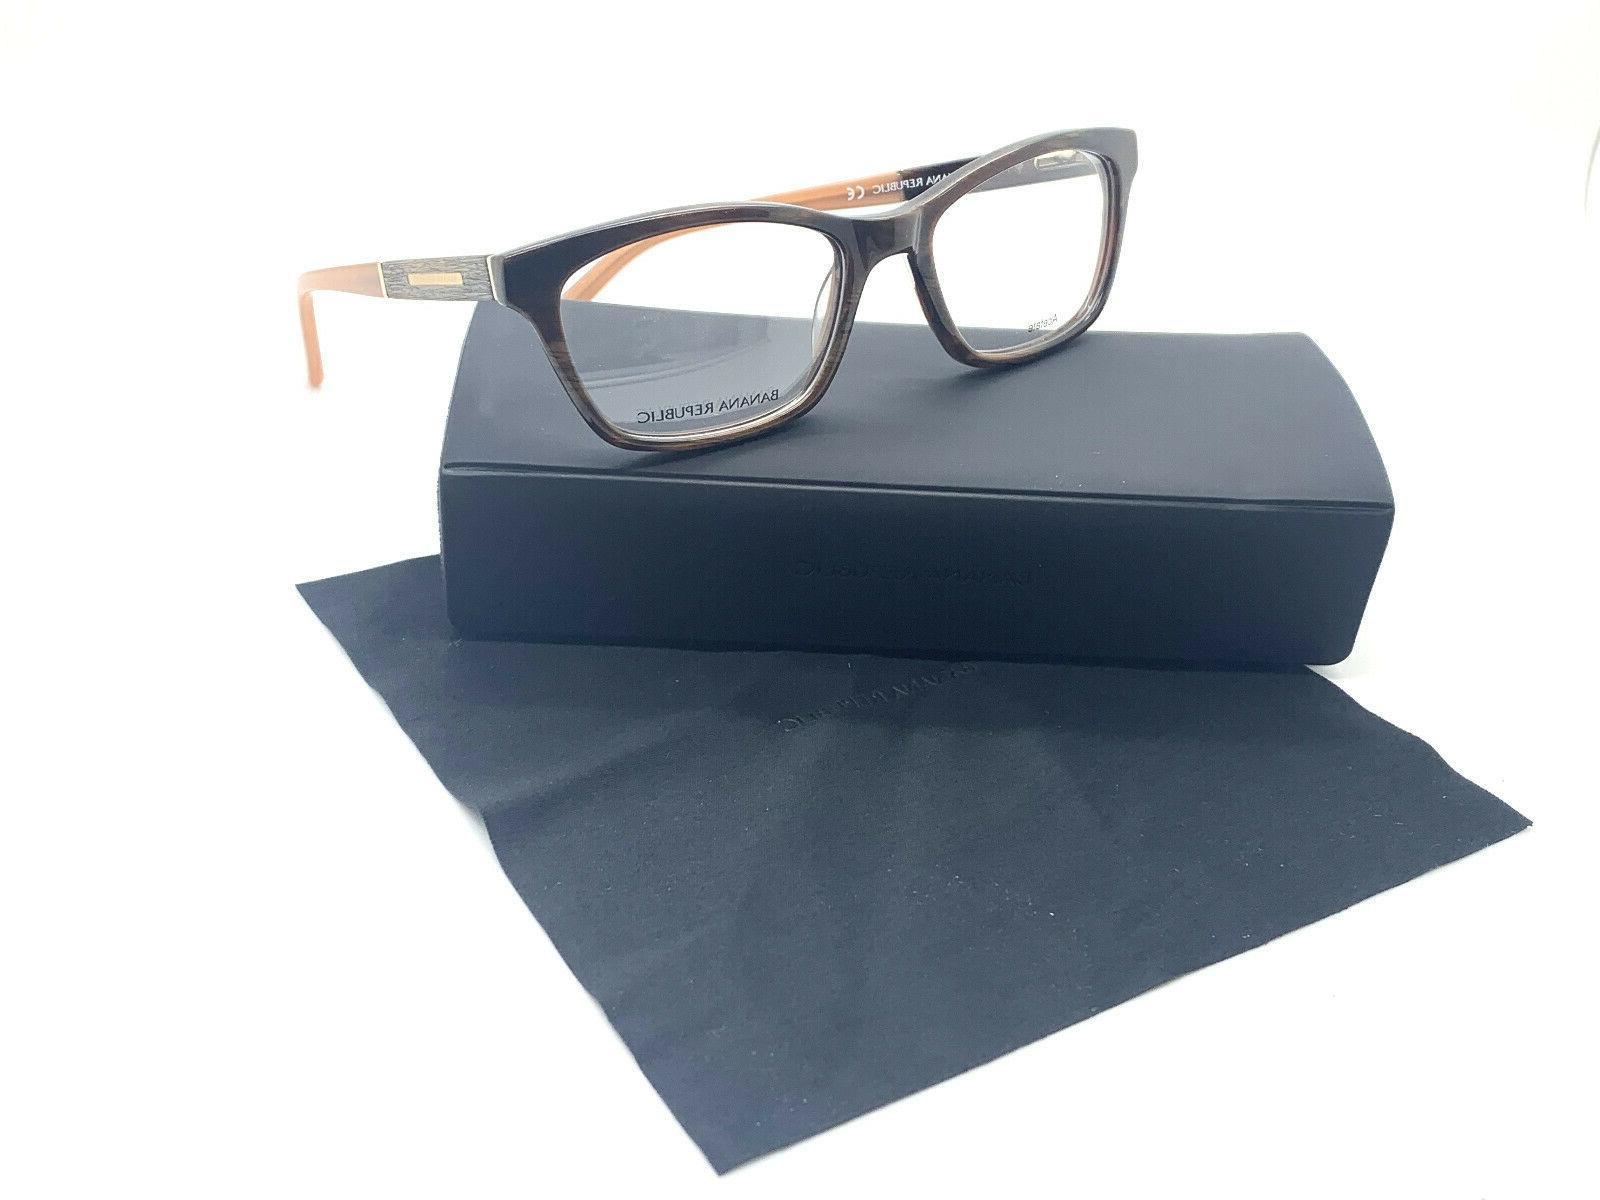 eyeglasses celine 0de3 51 17 135 new